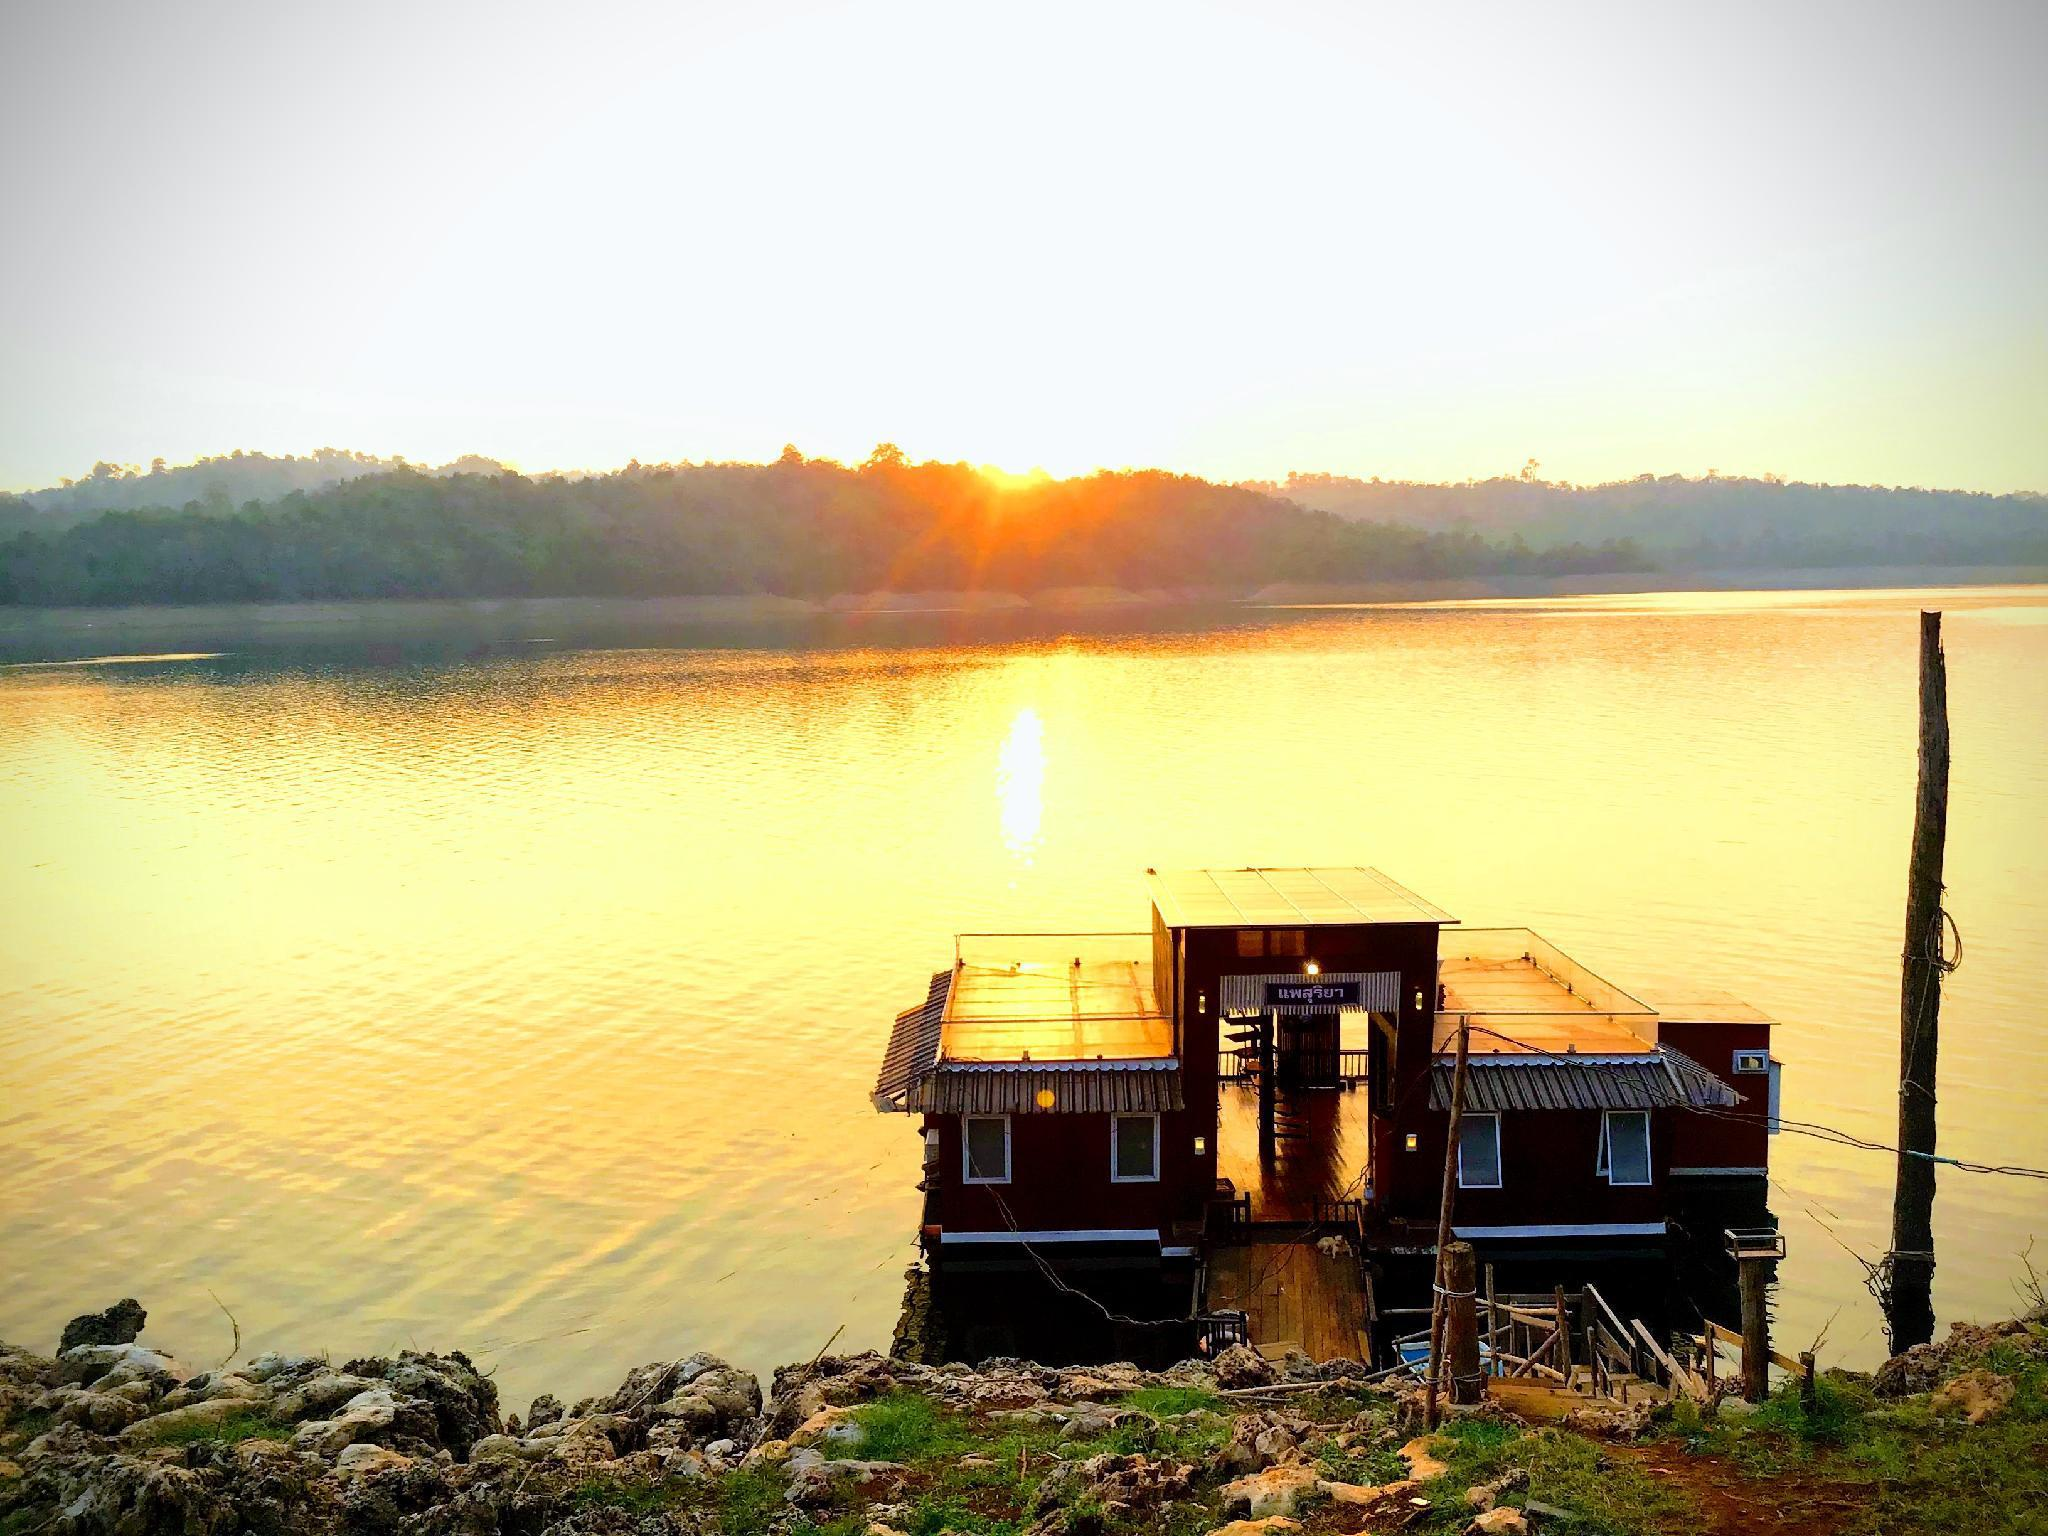 Boat House Suriya บ้านเดี่ยว 2 ห้องนอน 2 ห้องน้ำส่วนตัว ขนาด 130 ตร.ม. – ทองผาภูมิ